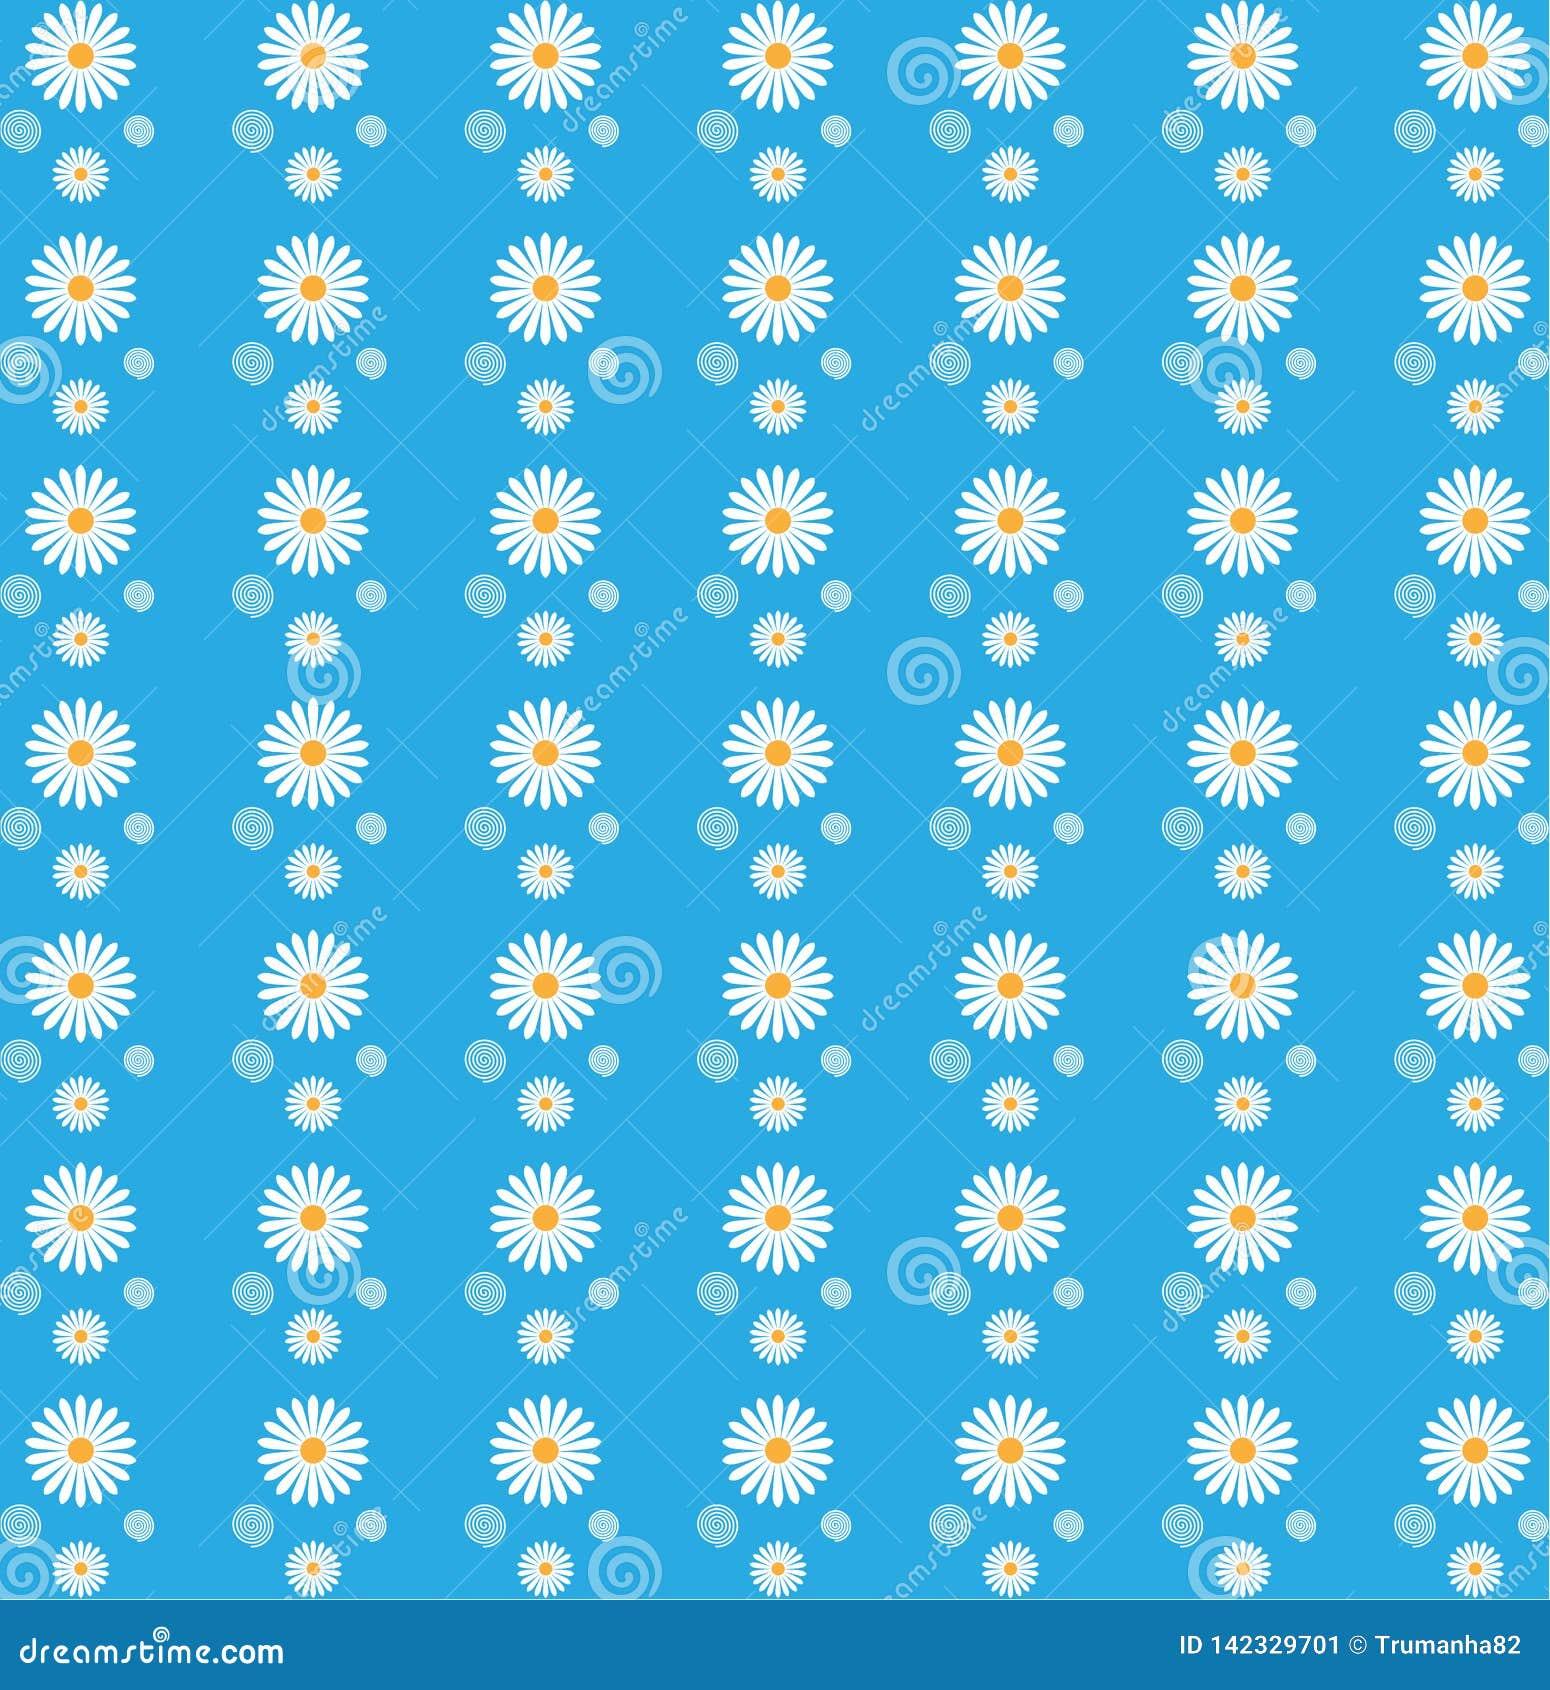 Floral άνευ ραφής σχέδιο των άσπρων μαργαριτών στο μπλε υπόβαθρο